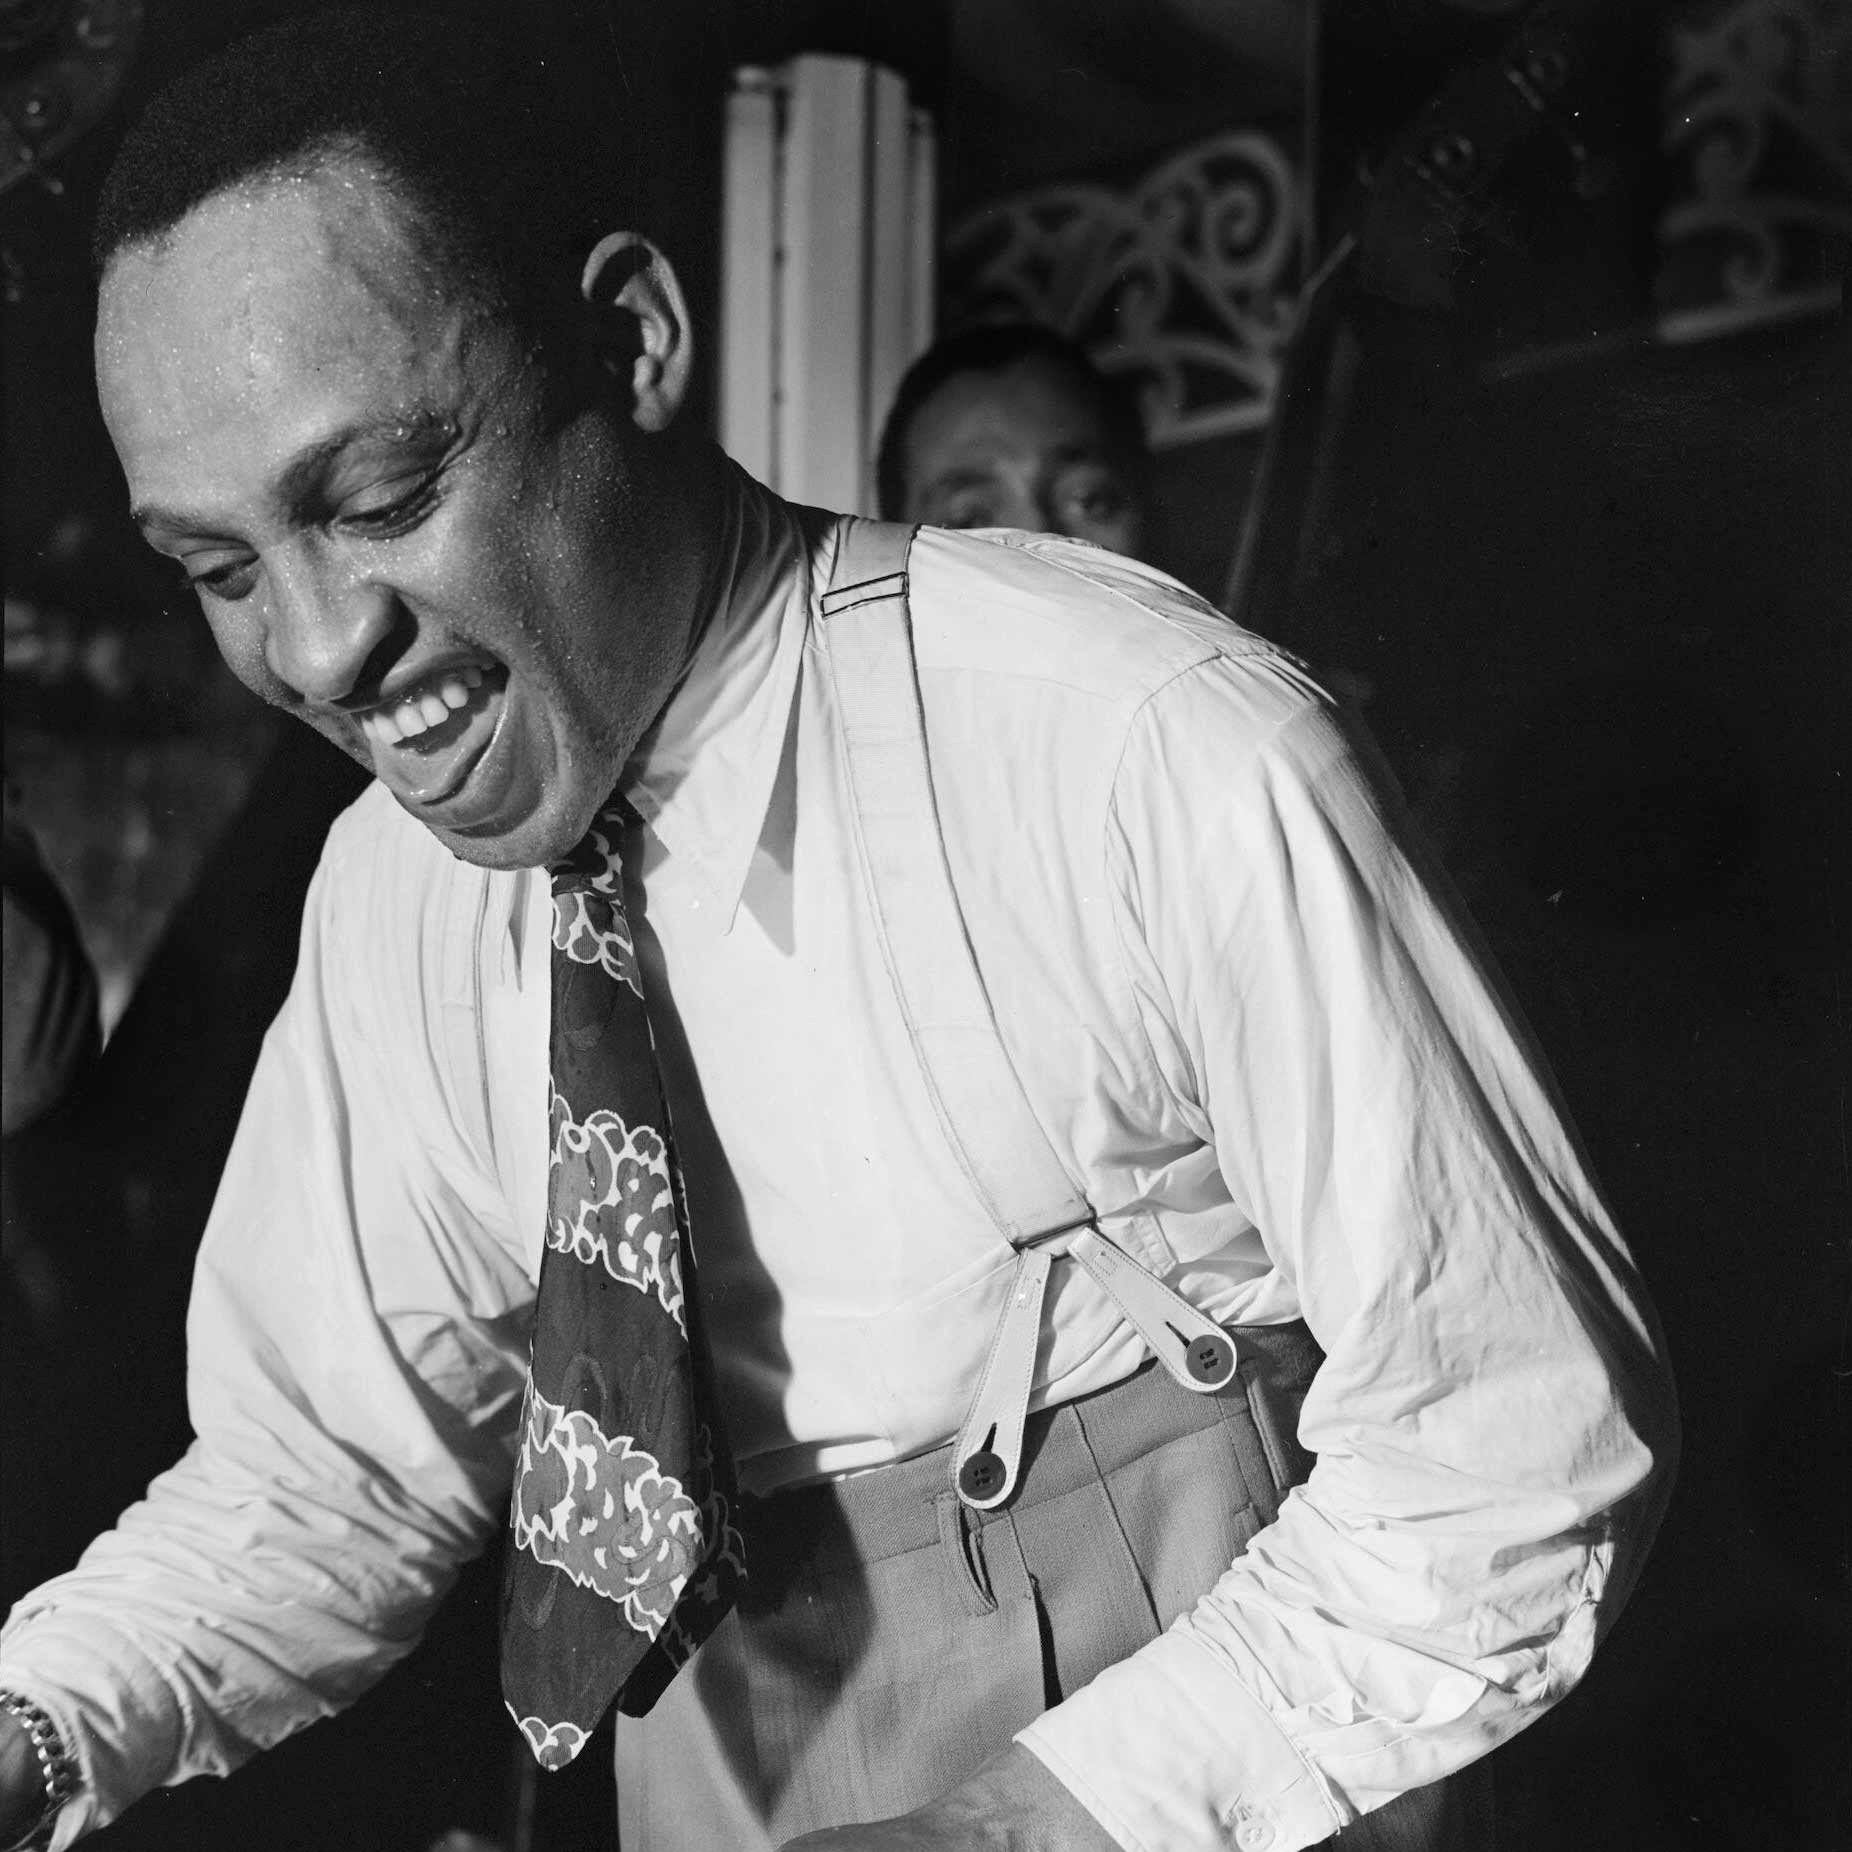 Lionel Hampton - December 28, 1938Jam session with Charlie Shavers (tp), Vernon Brown (tb), Dave Matthews (as), Herschel Evans (ts), Howard Smith (p), Milt Hinton (b), Cozy Cole (d), Lionel Hampton (vib, p, voc).12. Dinah13. Blues14. Chinatown, My Chinatown15. Stardust16. Rosetta